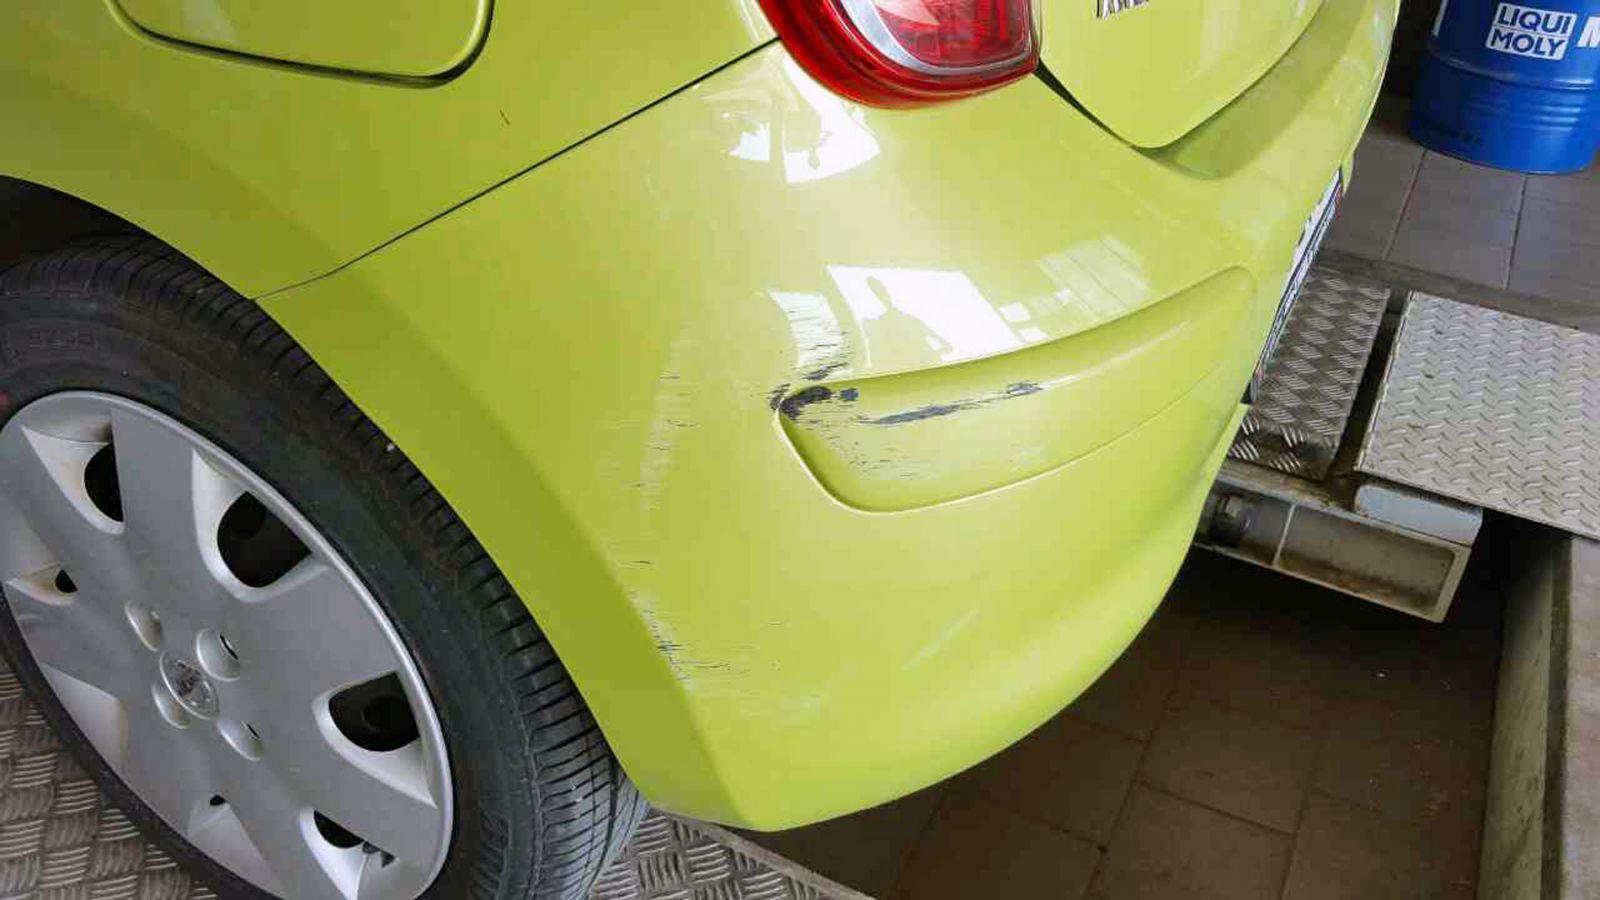 Unfallinstandsetzung - Auto-Linner